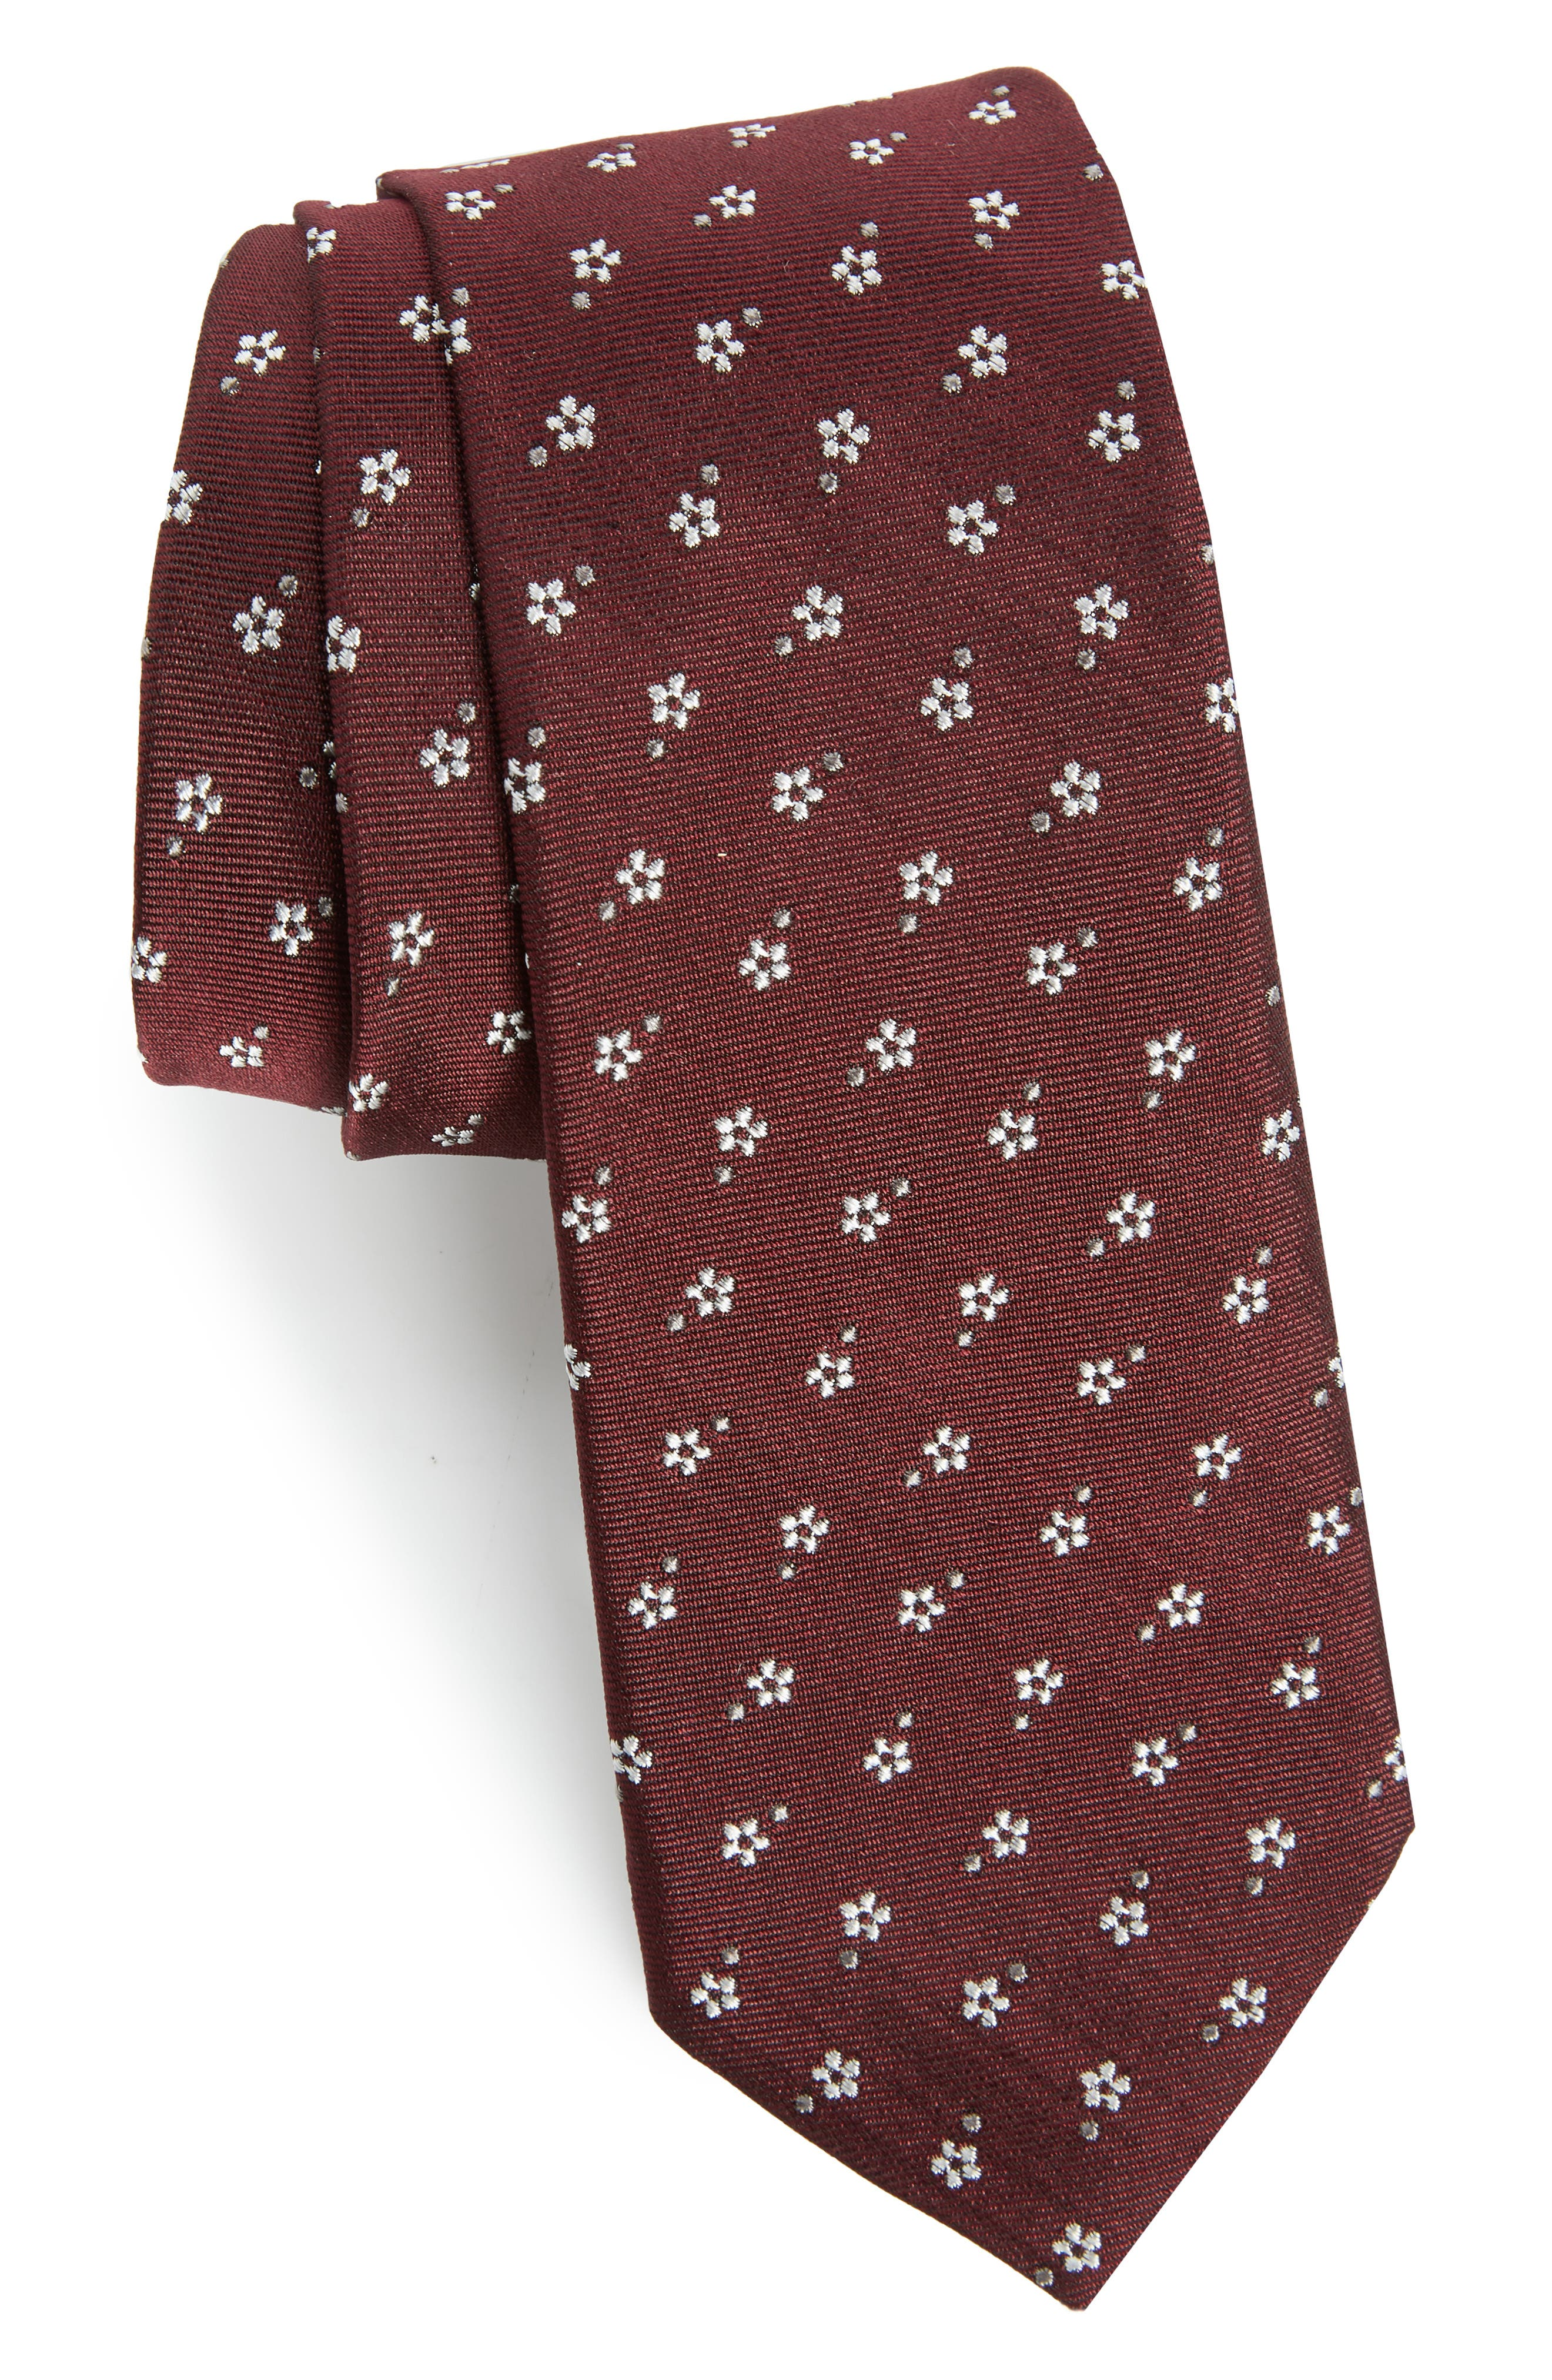 Floral Print Skinny Tie,                             Main thumbnail 1, color,                             Burgundy/ Bordeaux